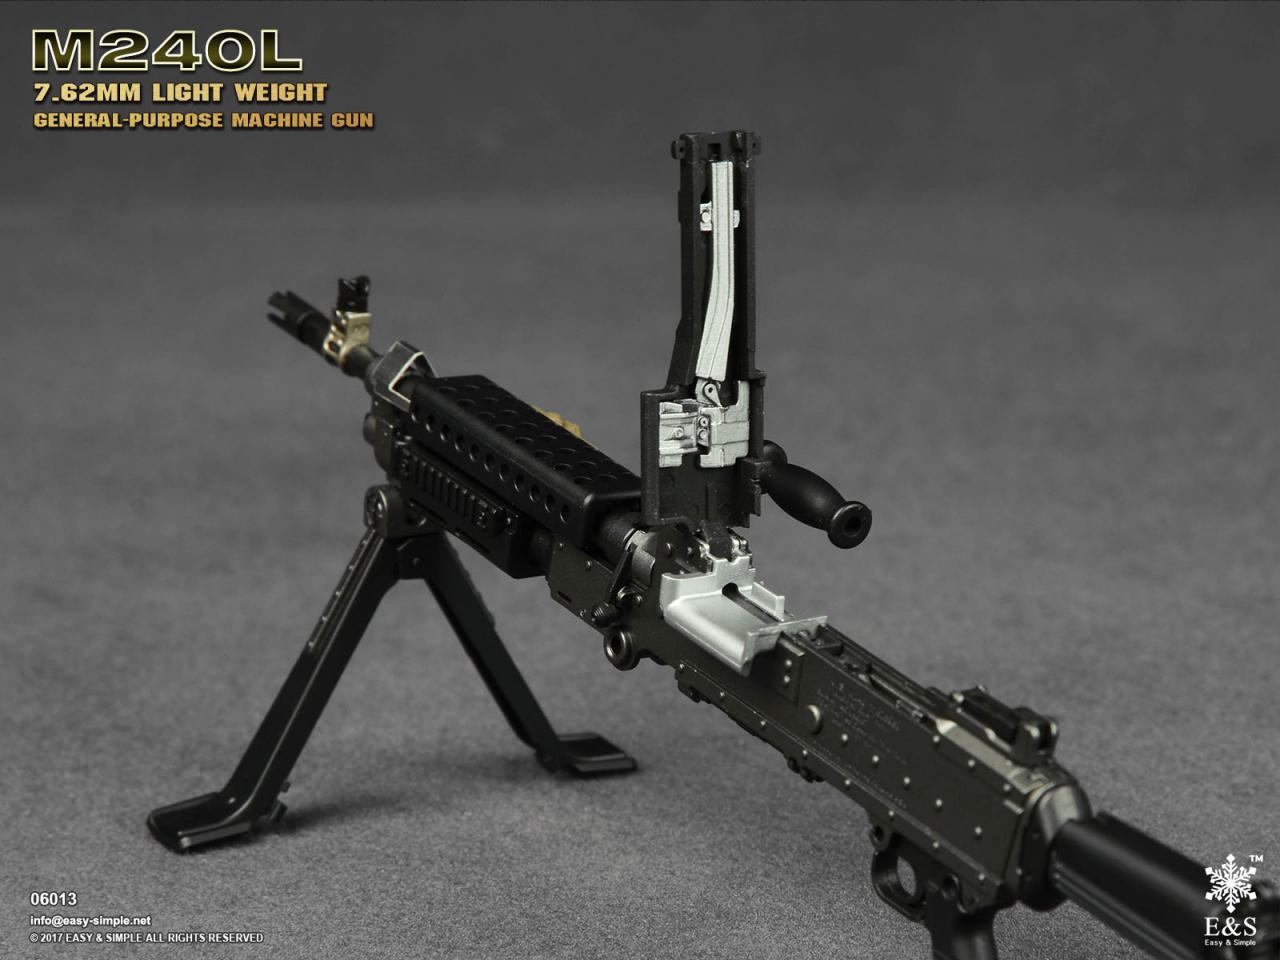 Easy&Simple 06013 M240L 7.62mm Light Weight General Purpose Machine Gun-06013-12-jpg